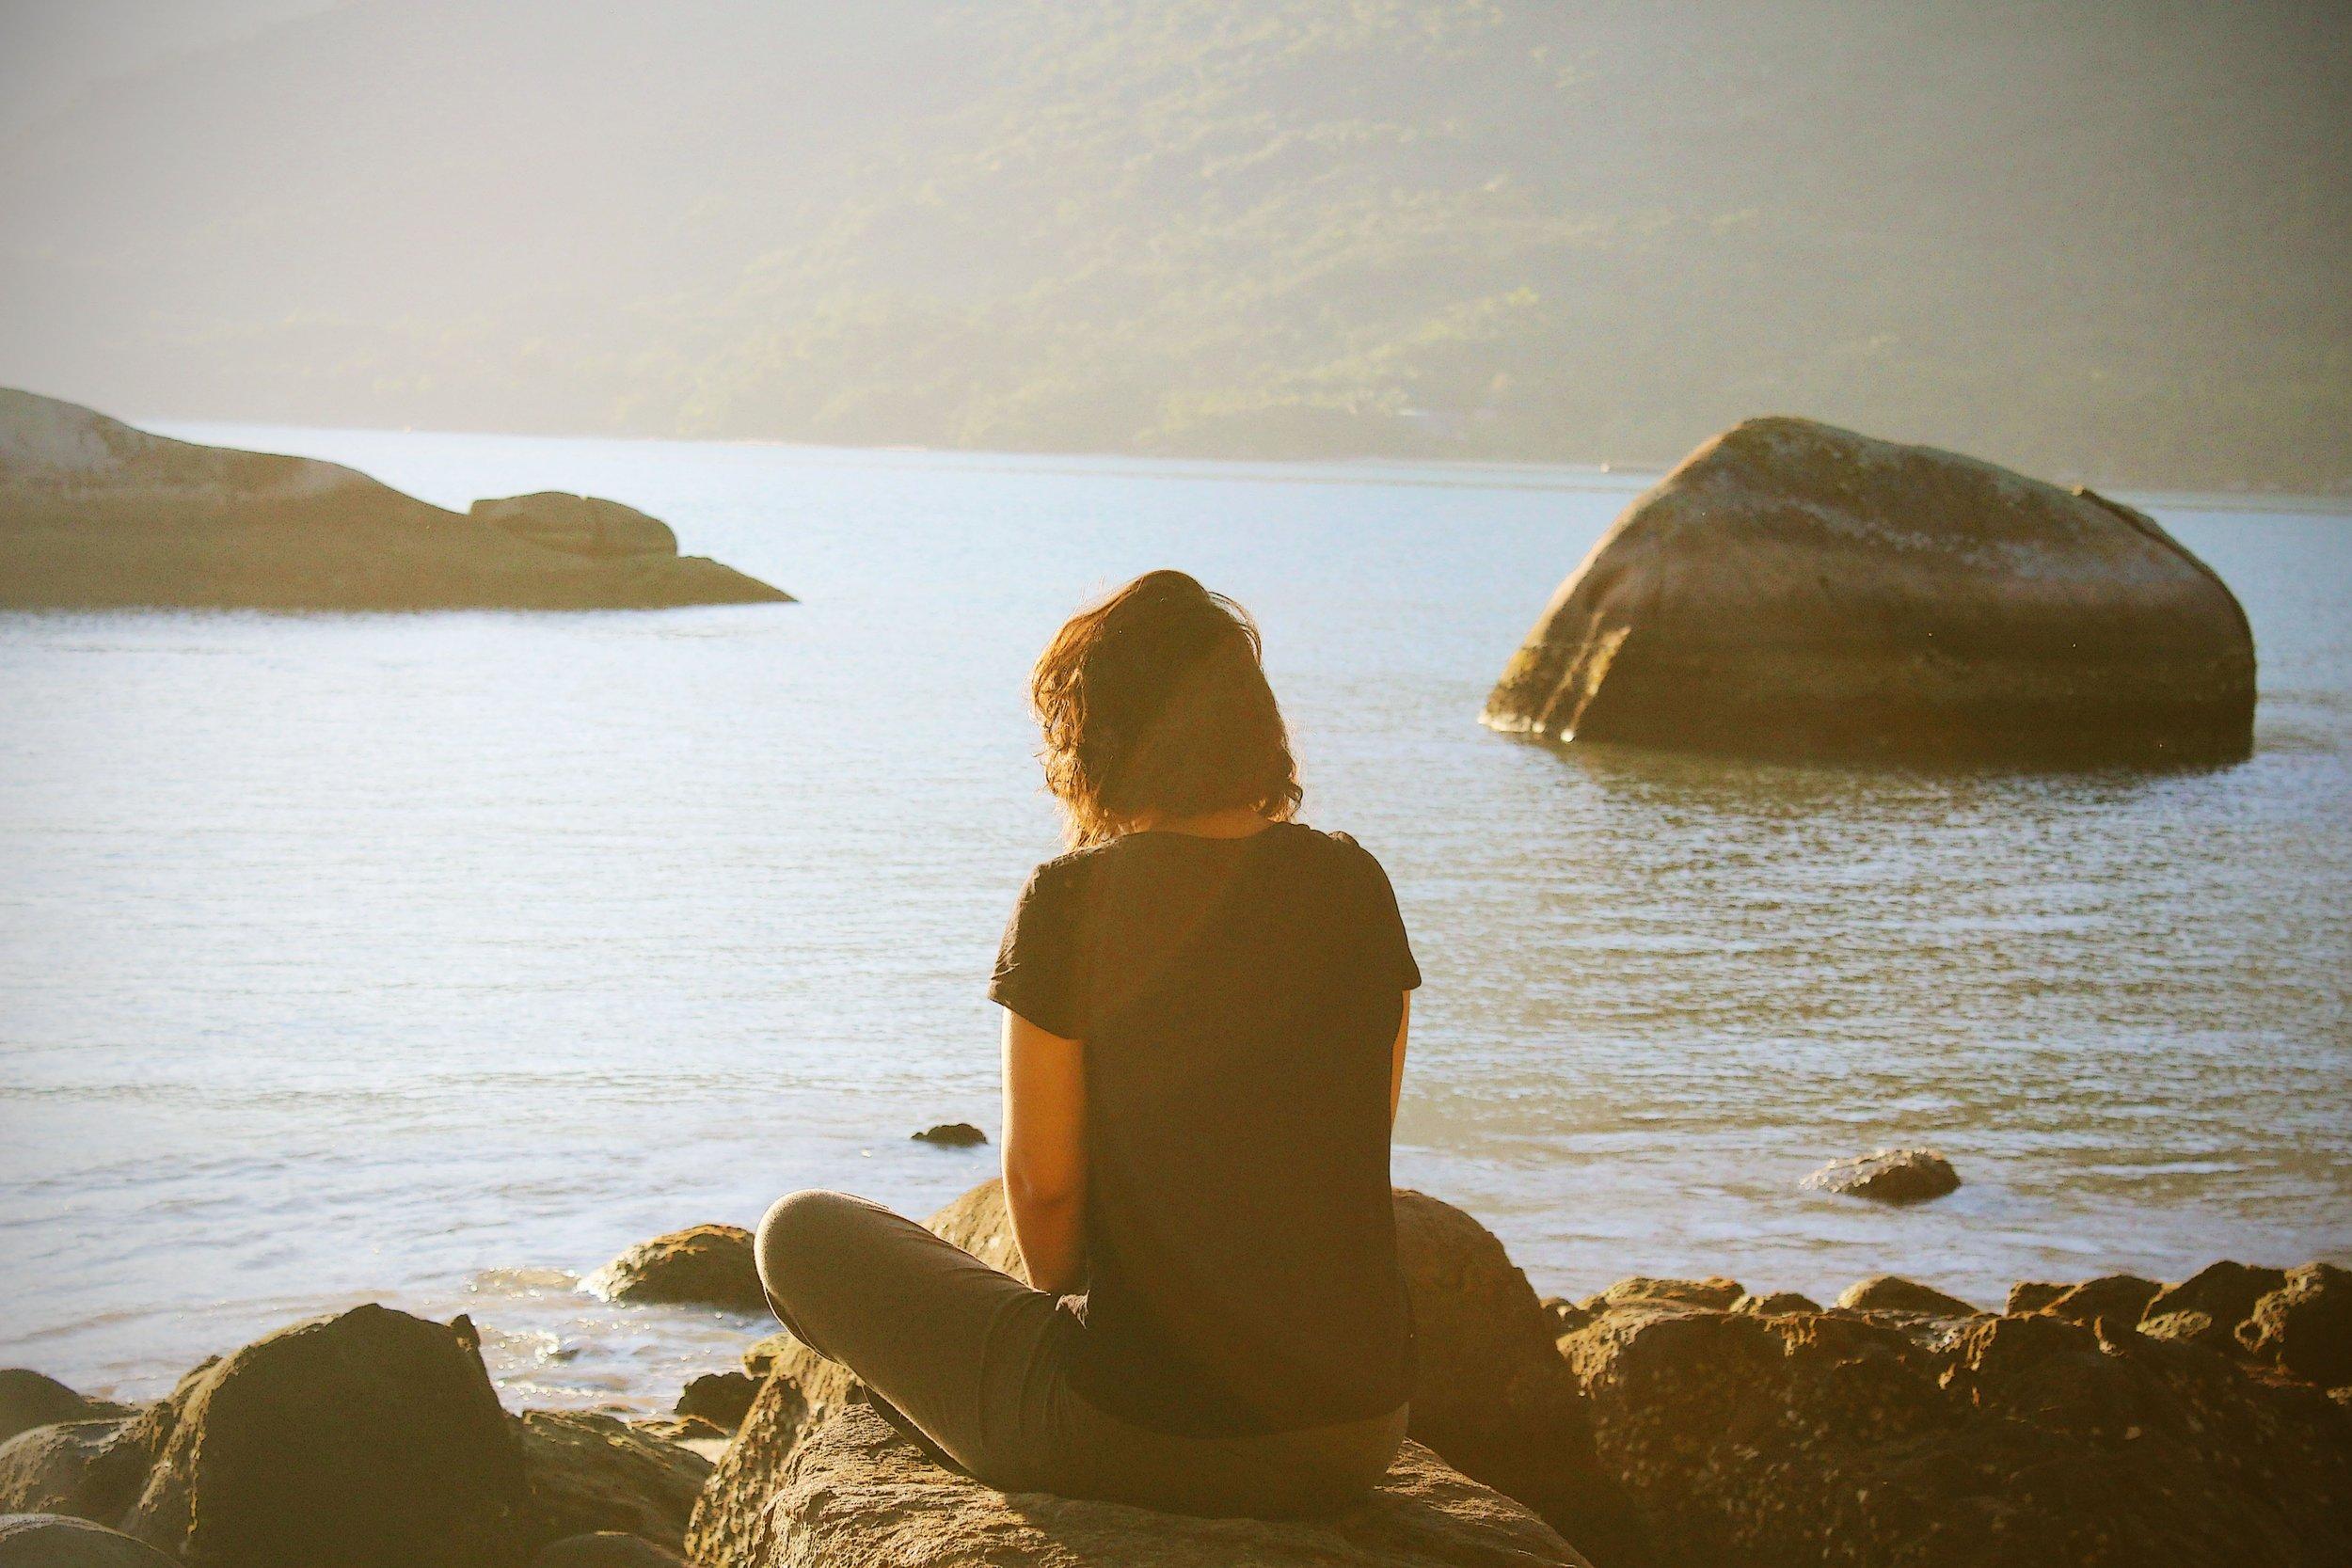 lua-valentia-meditation.jpg